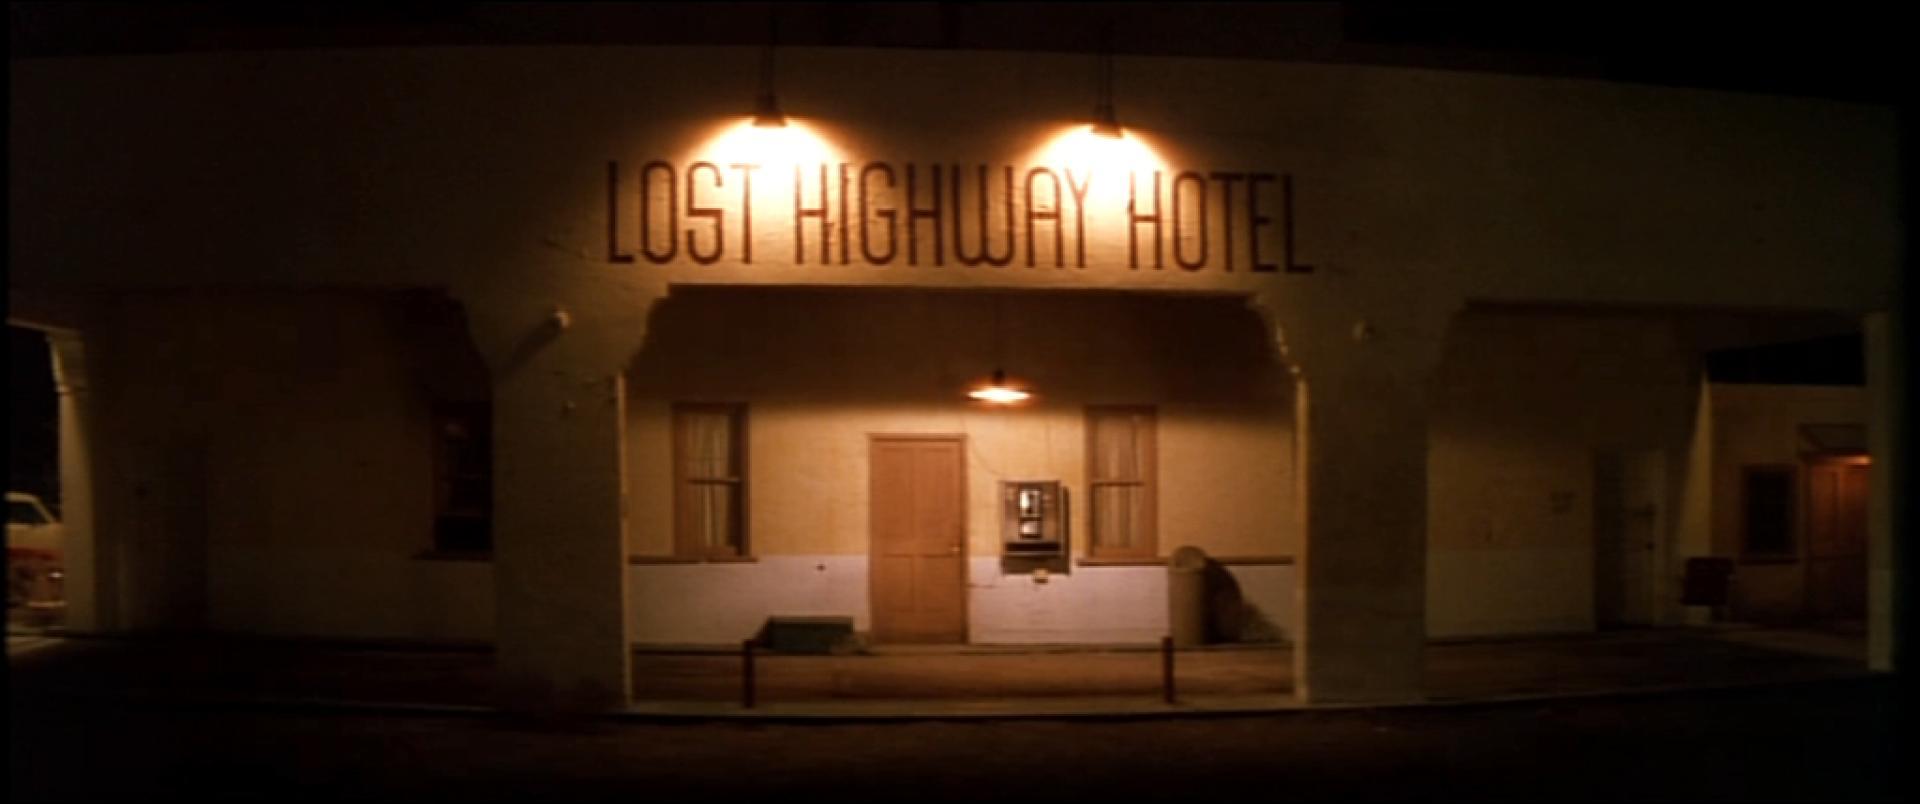 lost_highway_4_kep